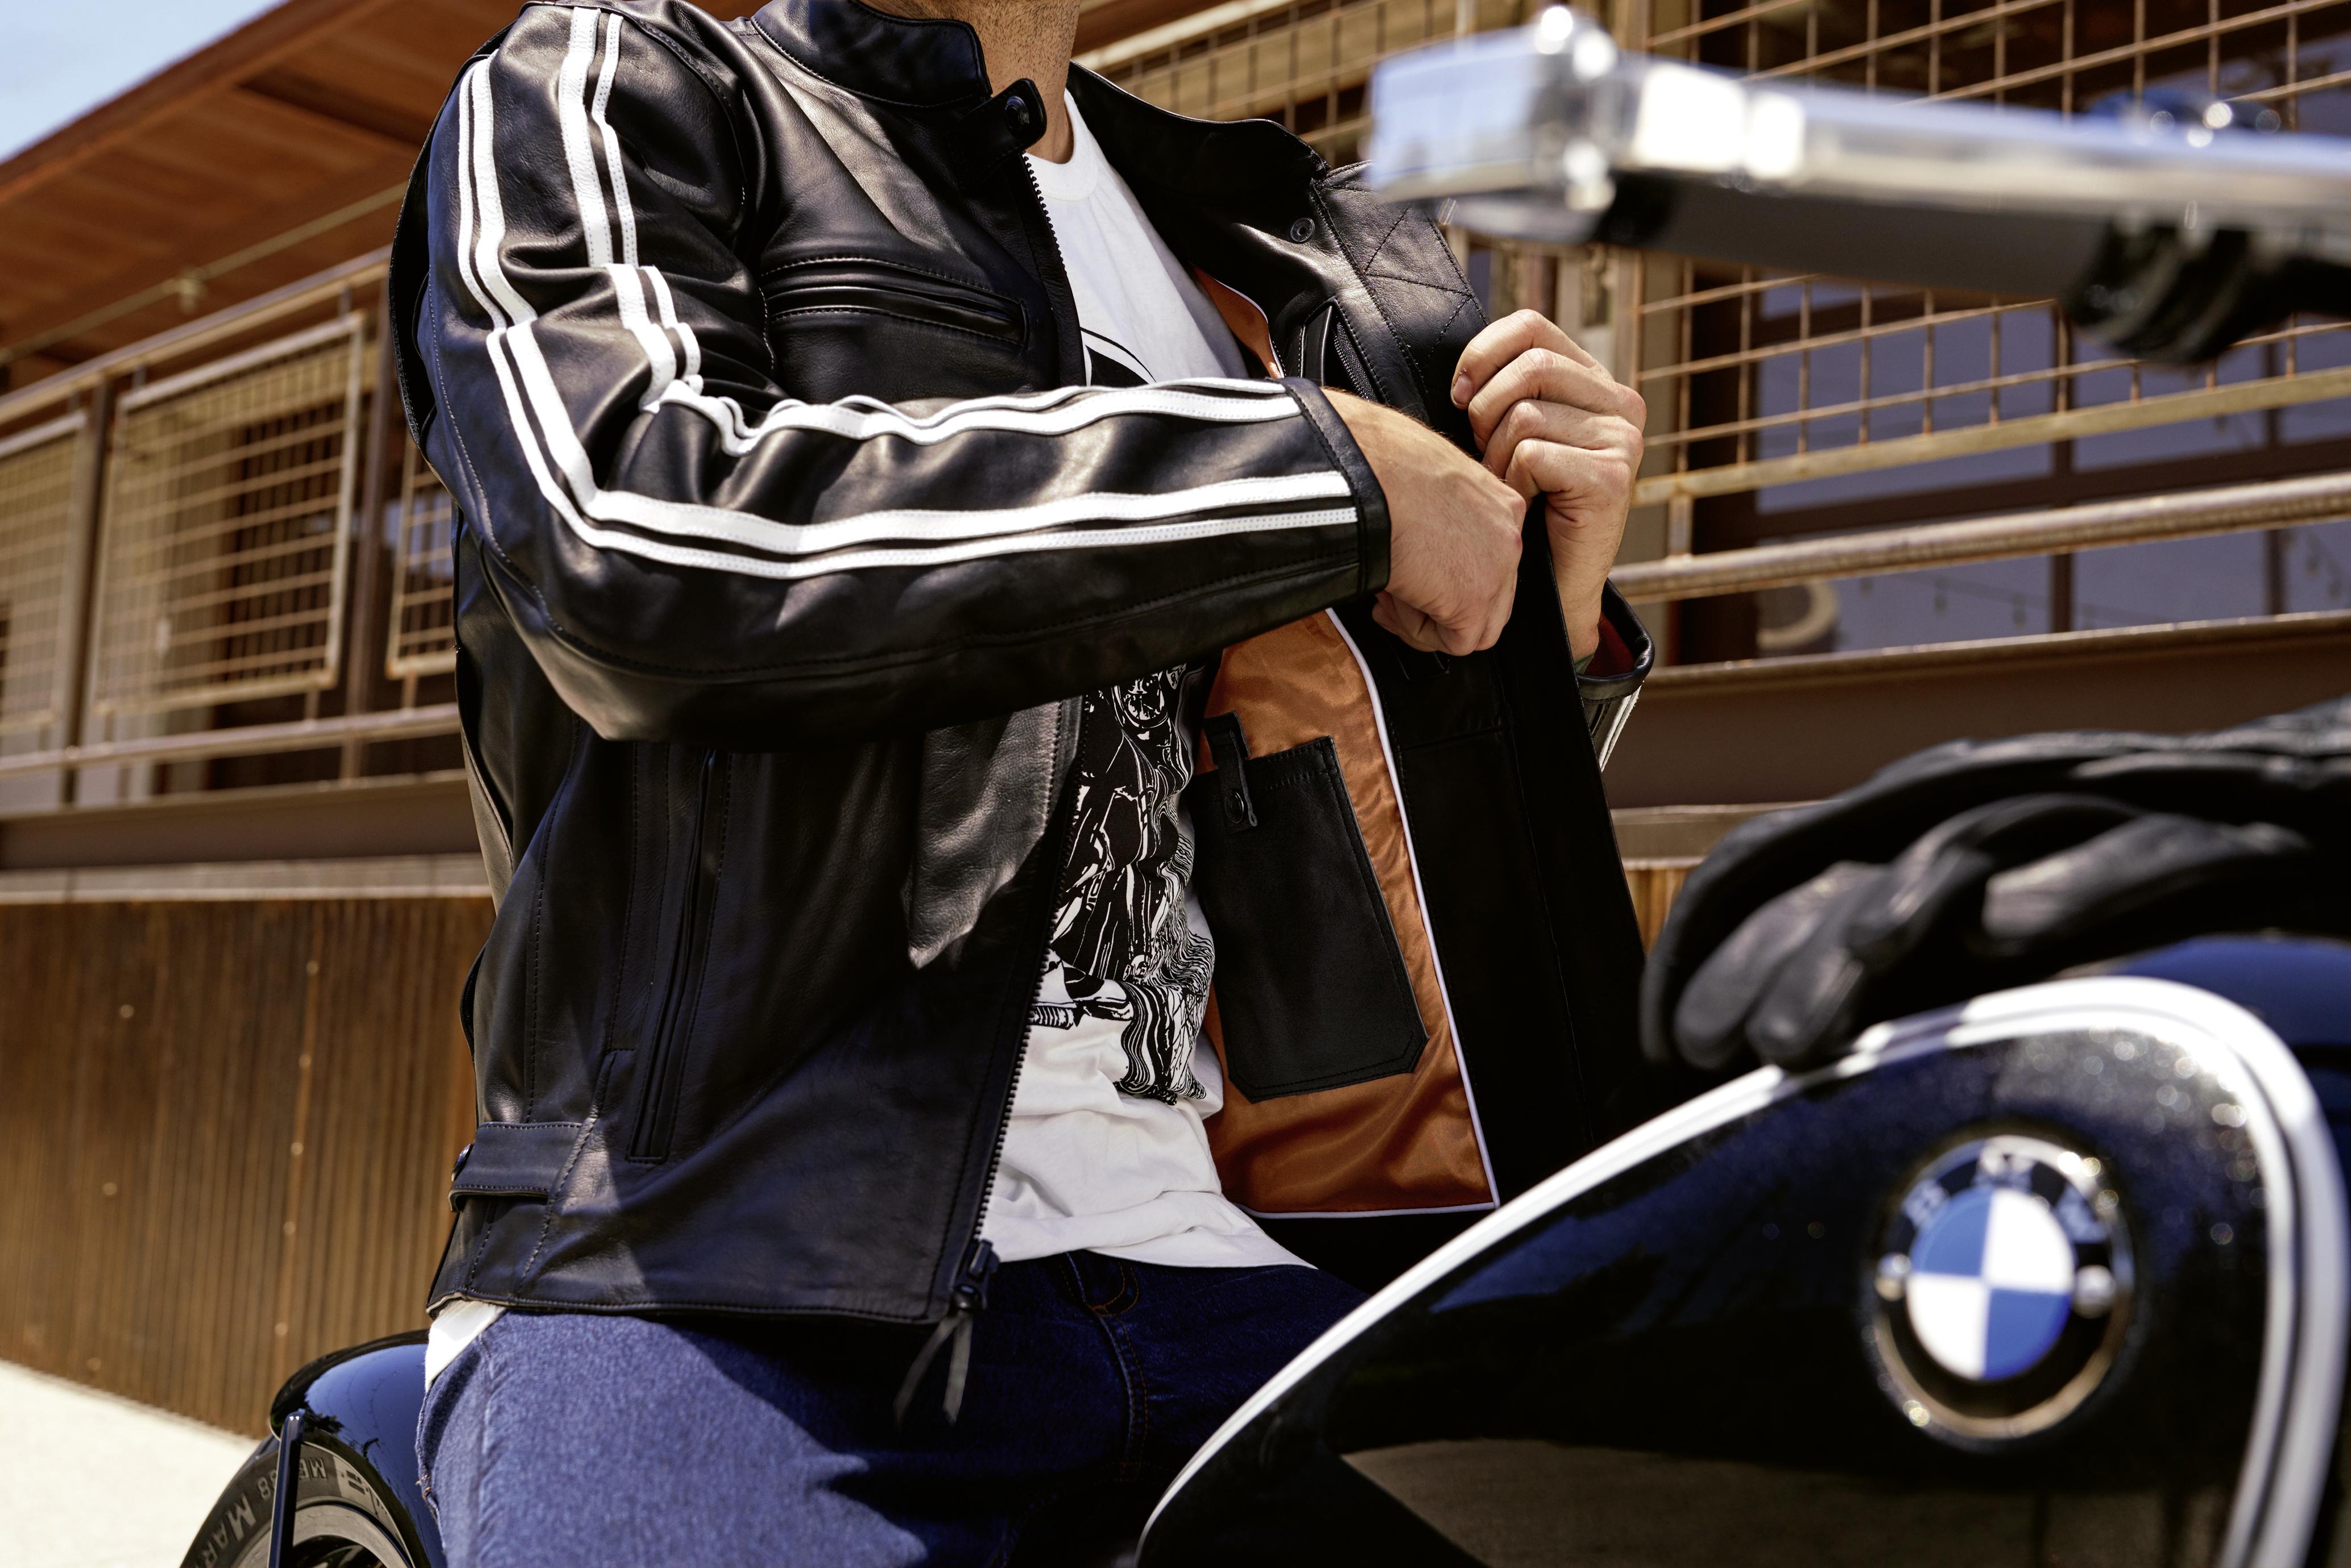 rock, roll & ride | BMW Motorrad unveils its 2020 heritage